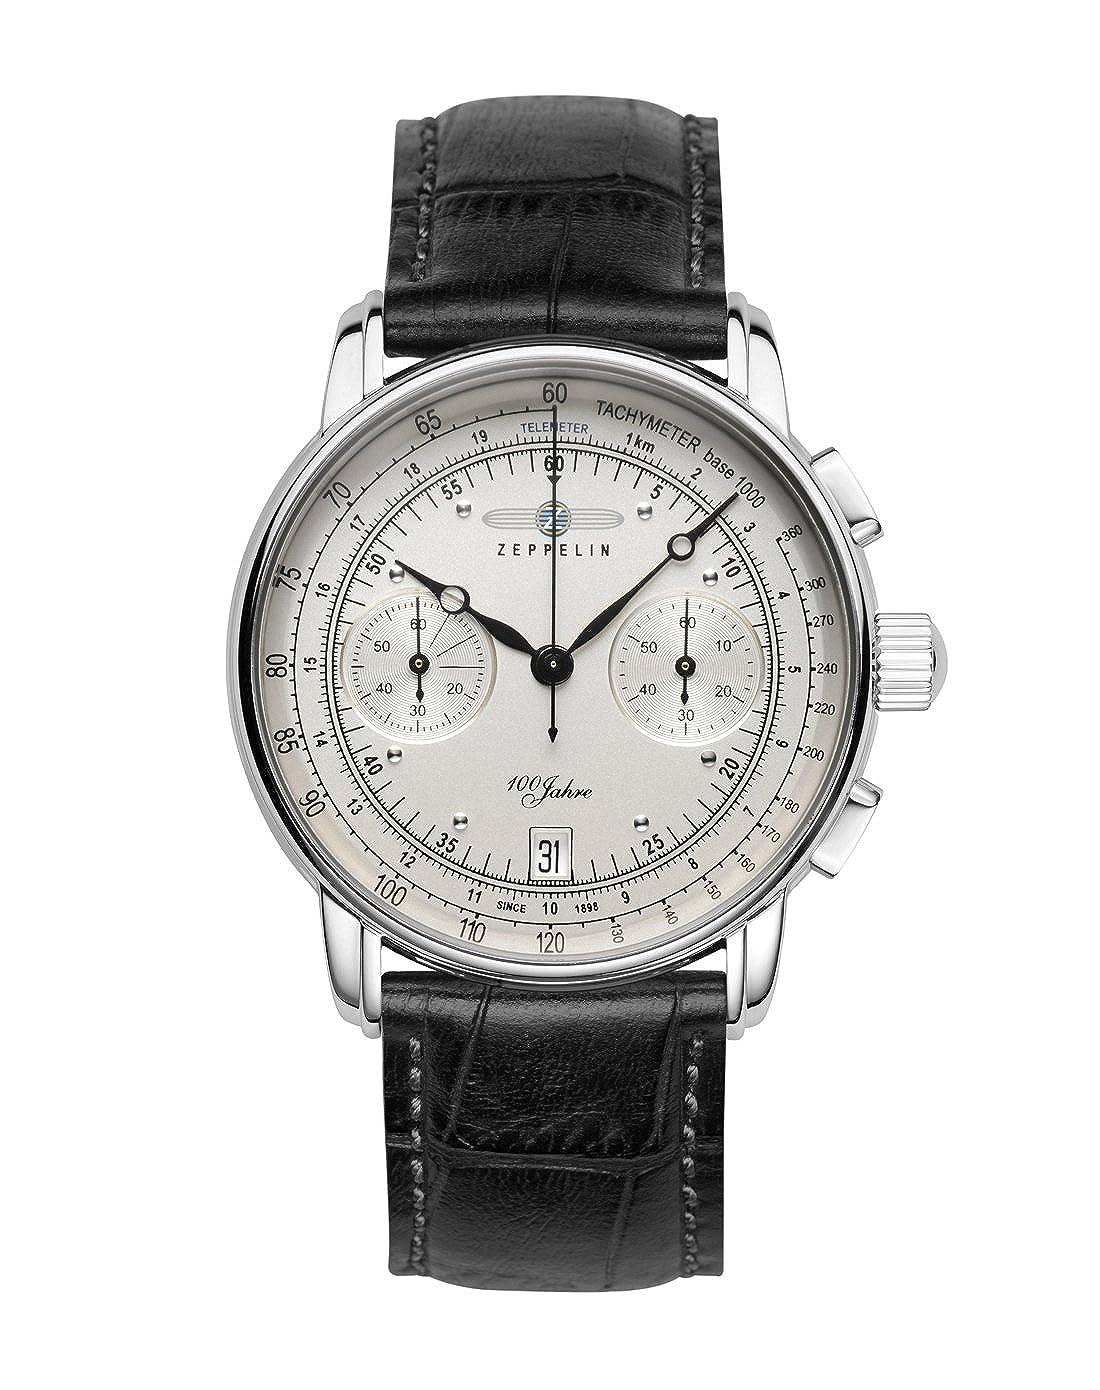 Amazon.com  Zeppelin 7670-1 100 Jahre Zeppelin Chrono 42mm 10ATM  Watches 54871db24ec